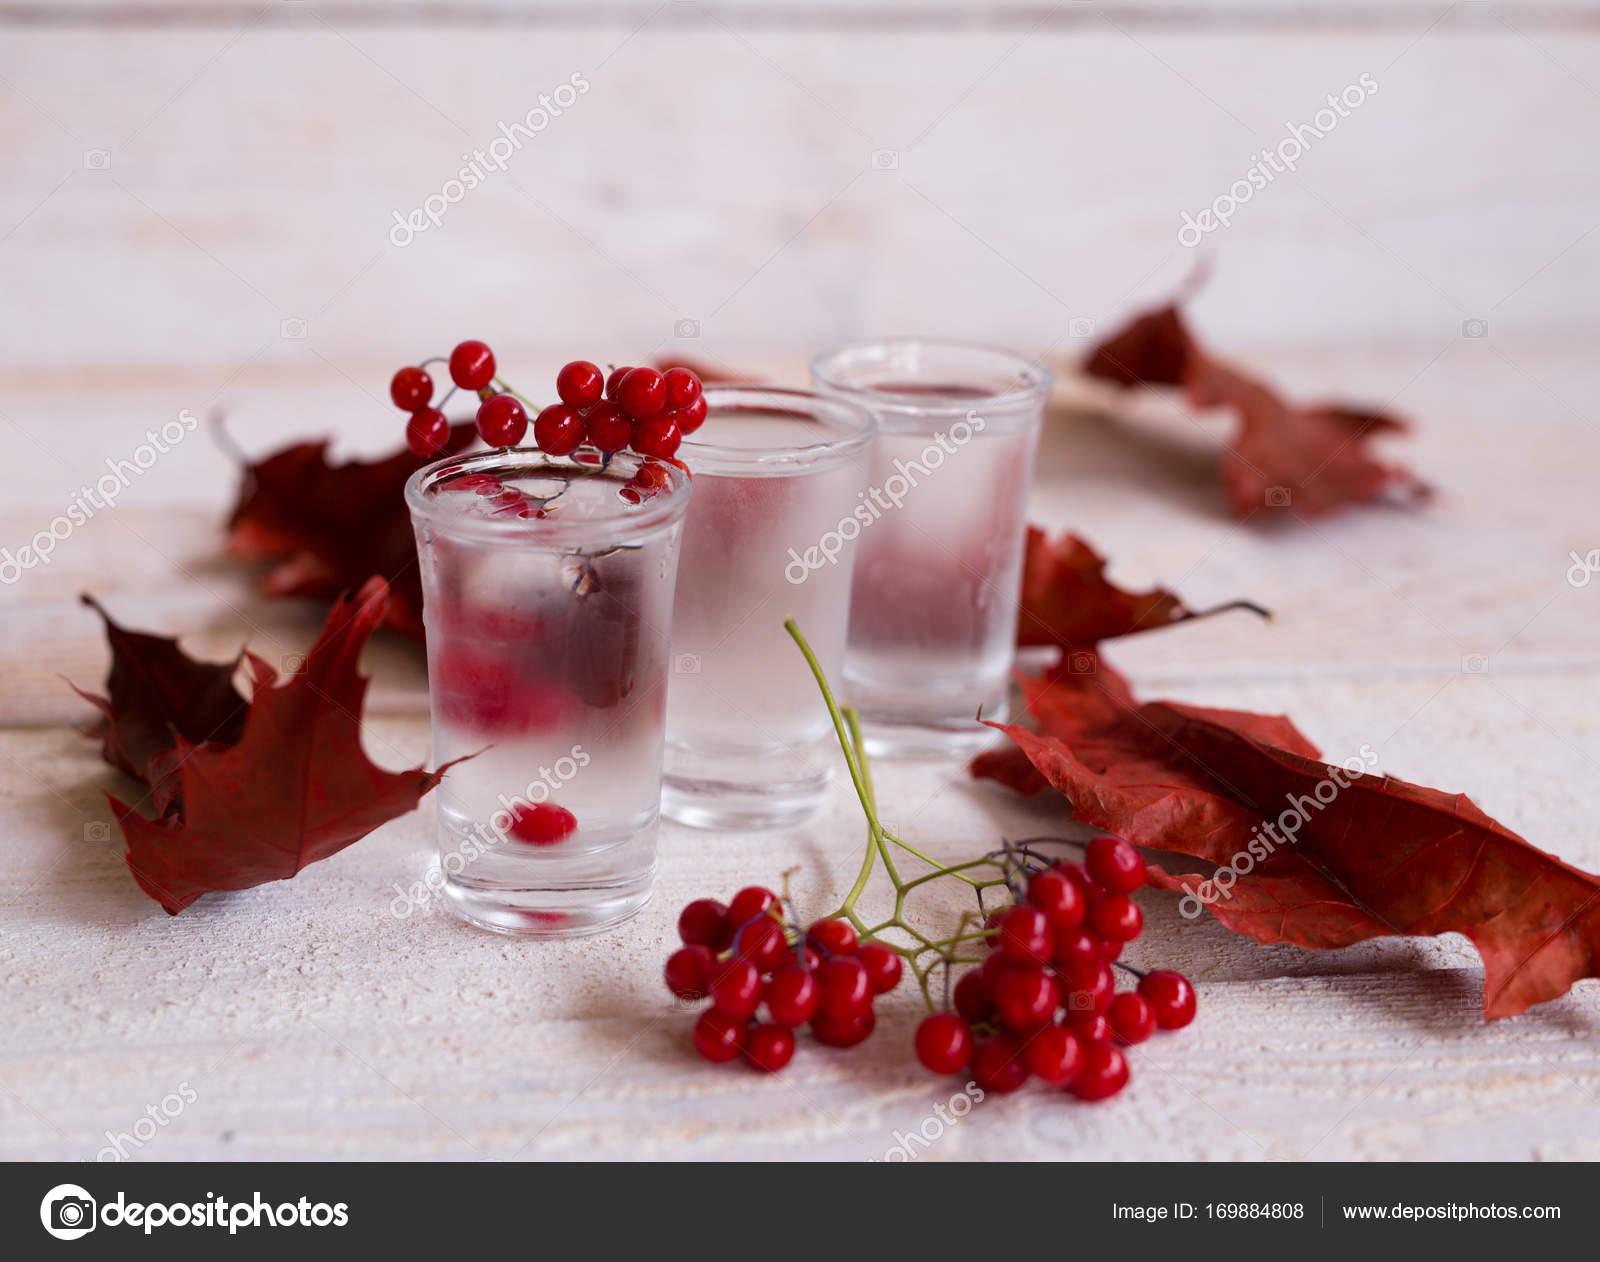 коктейль из водки и ягод